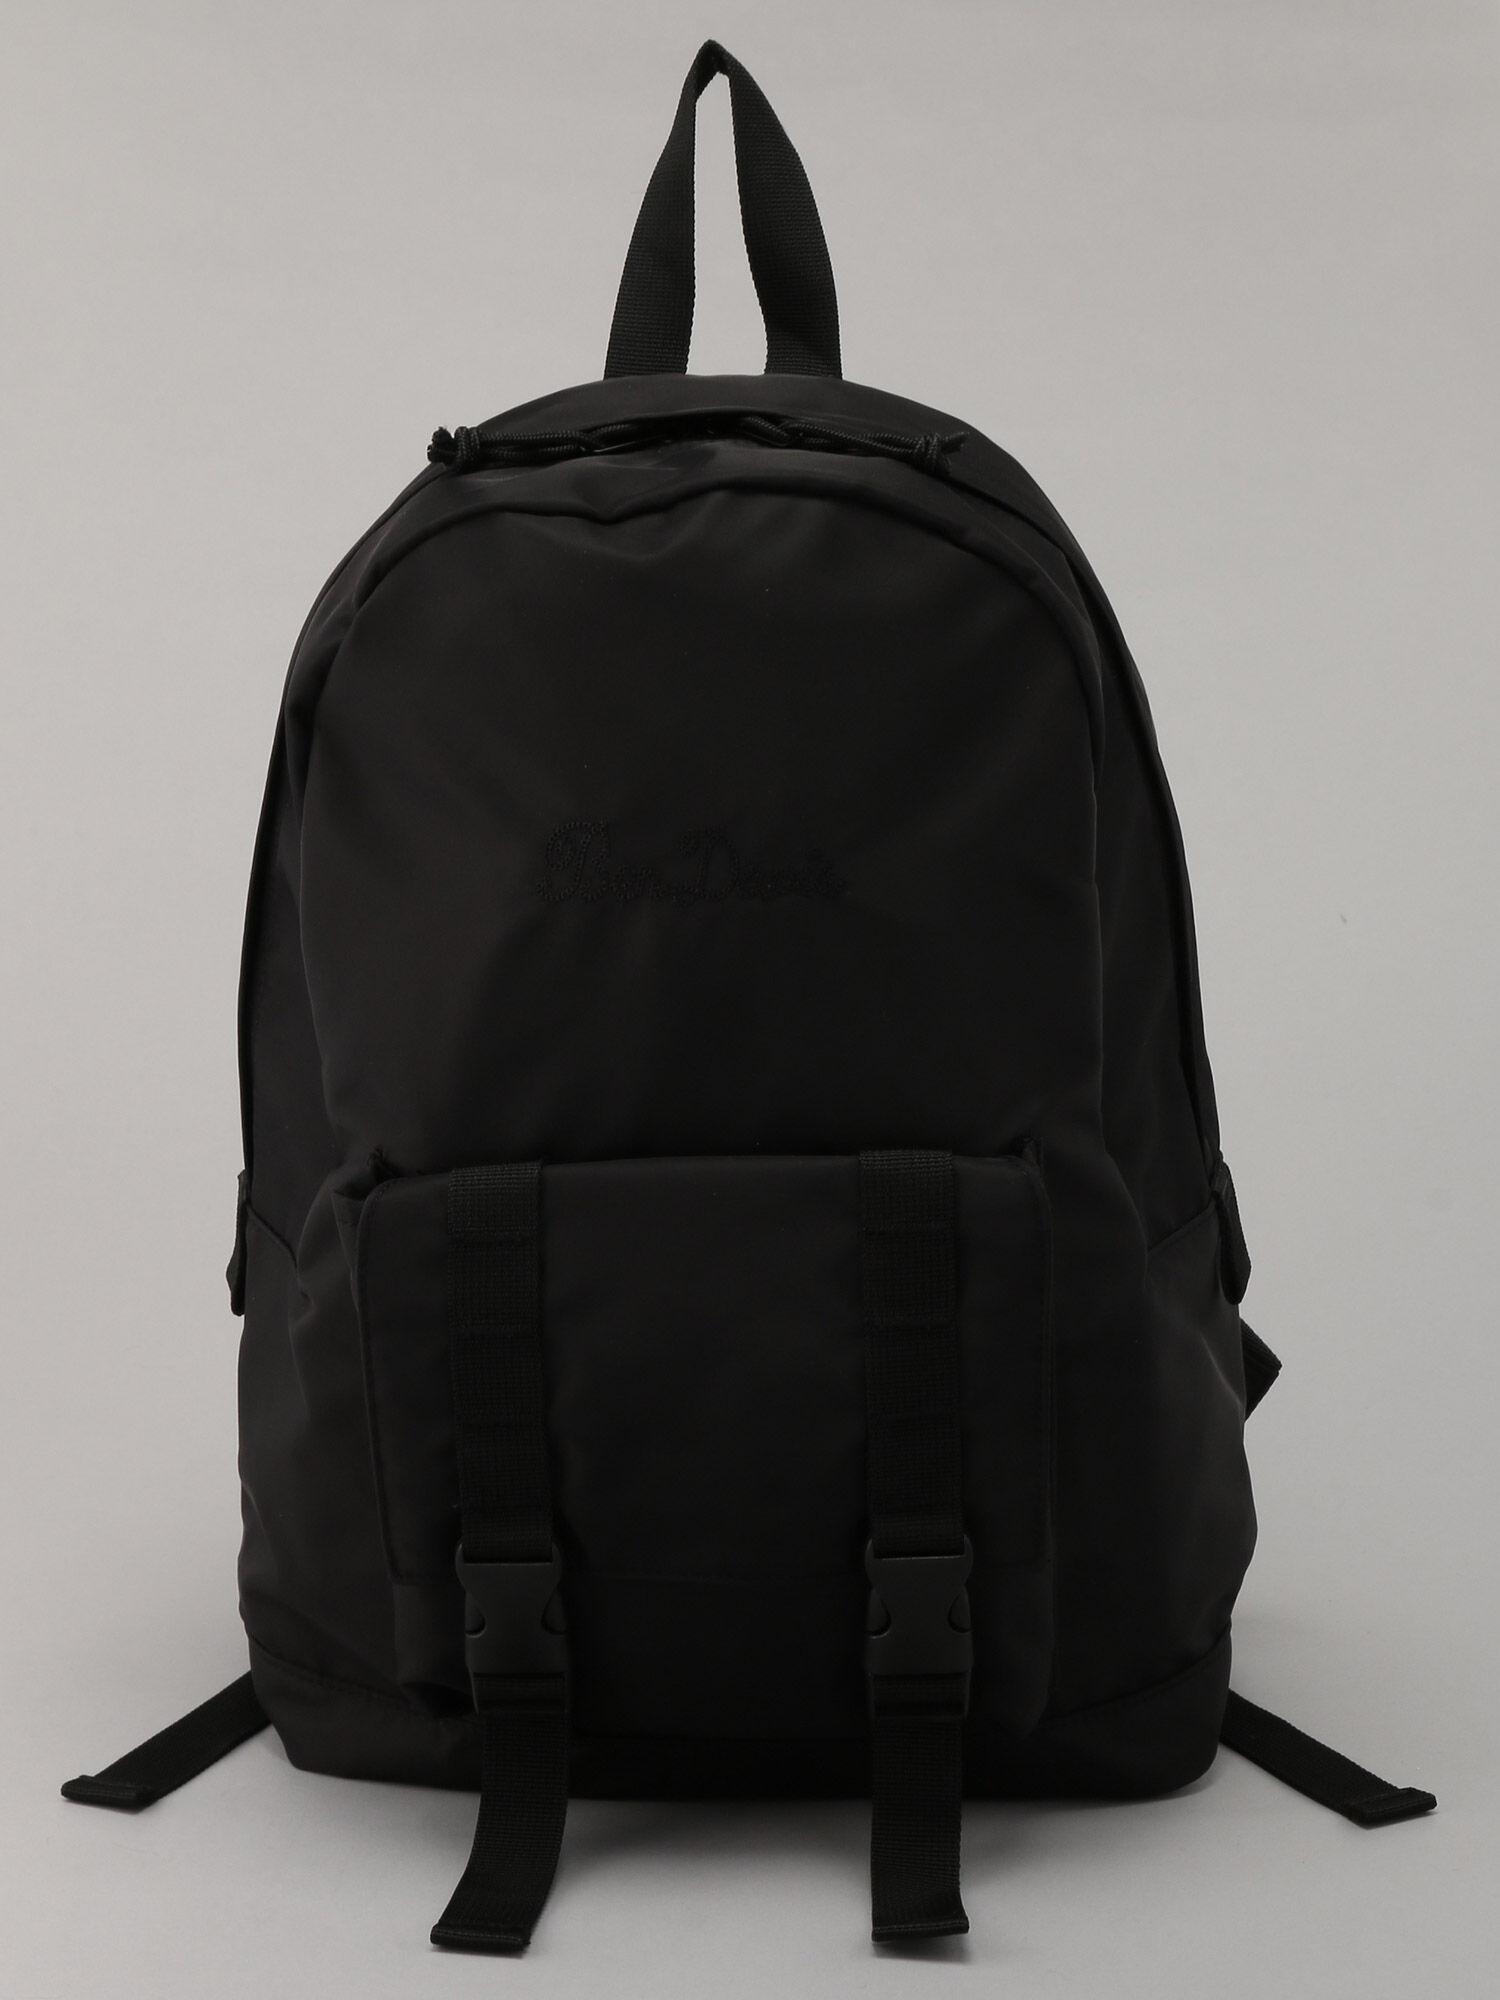 BENDAVISフラップポケットバッグパック